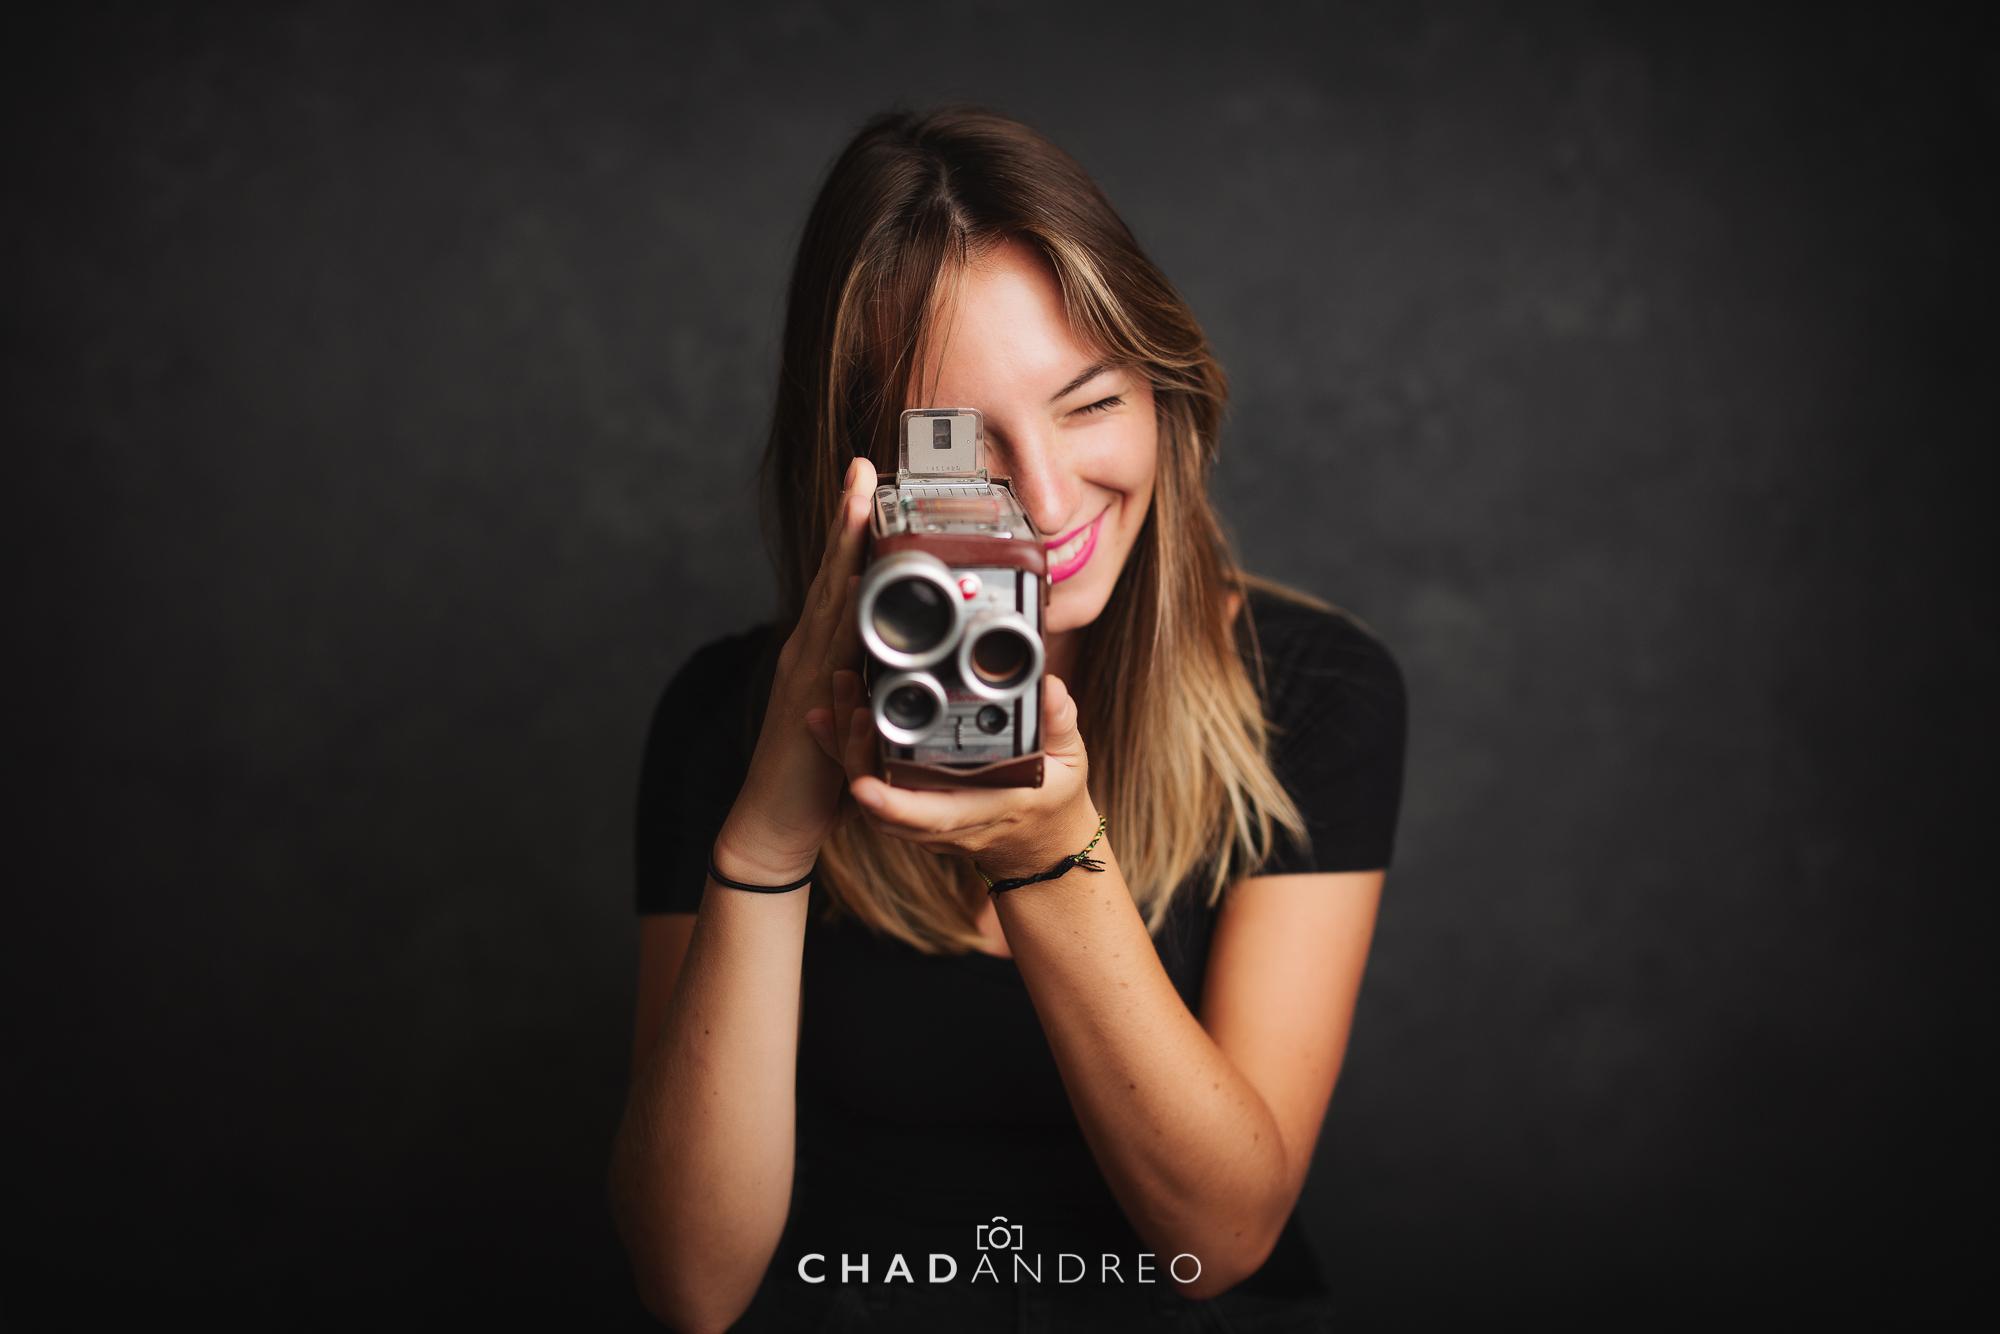 Chad Andreo Miami Photographer-9765-Edit.jpg